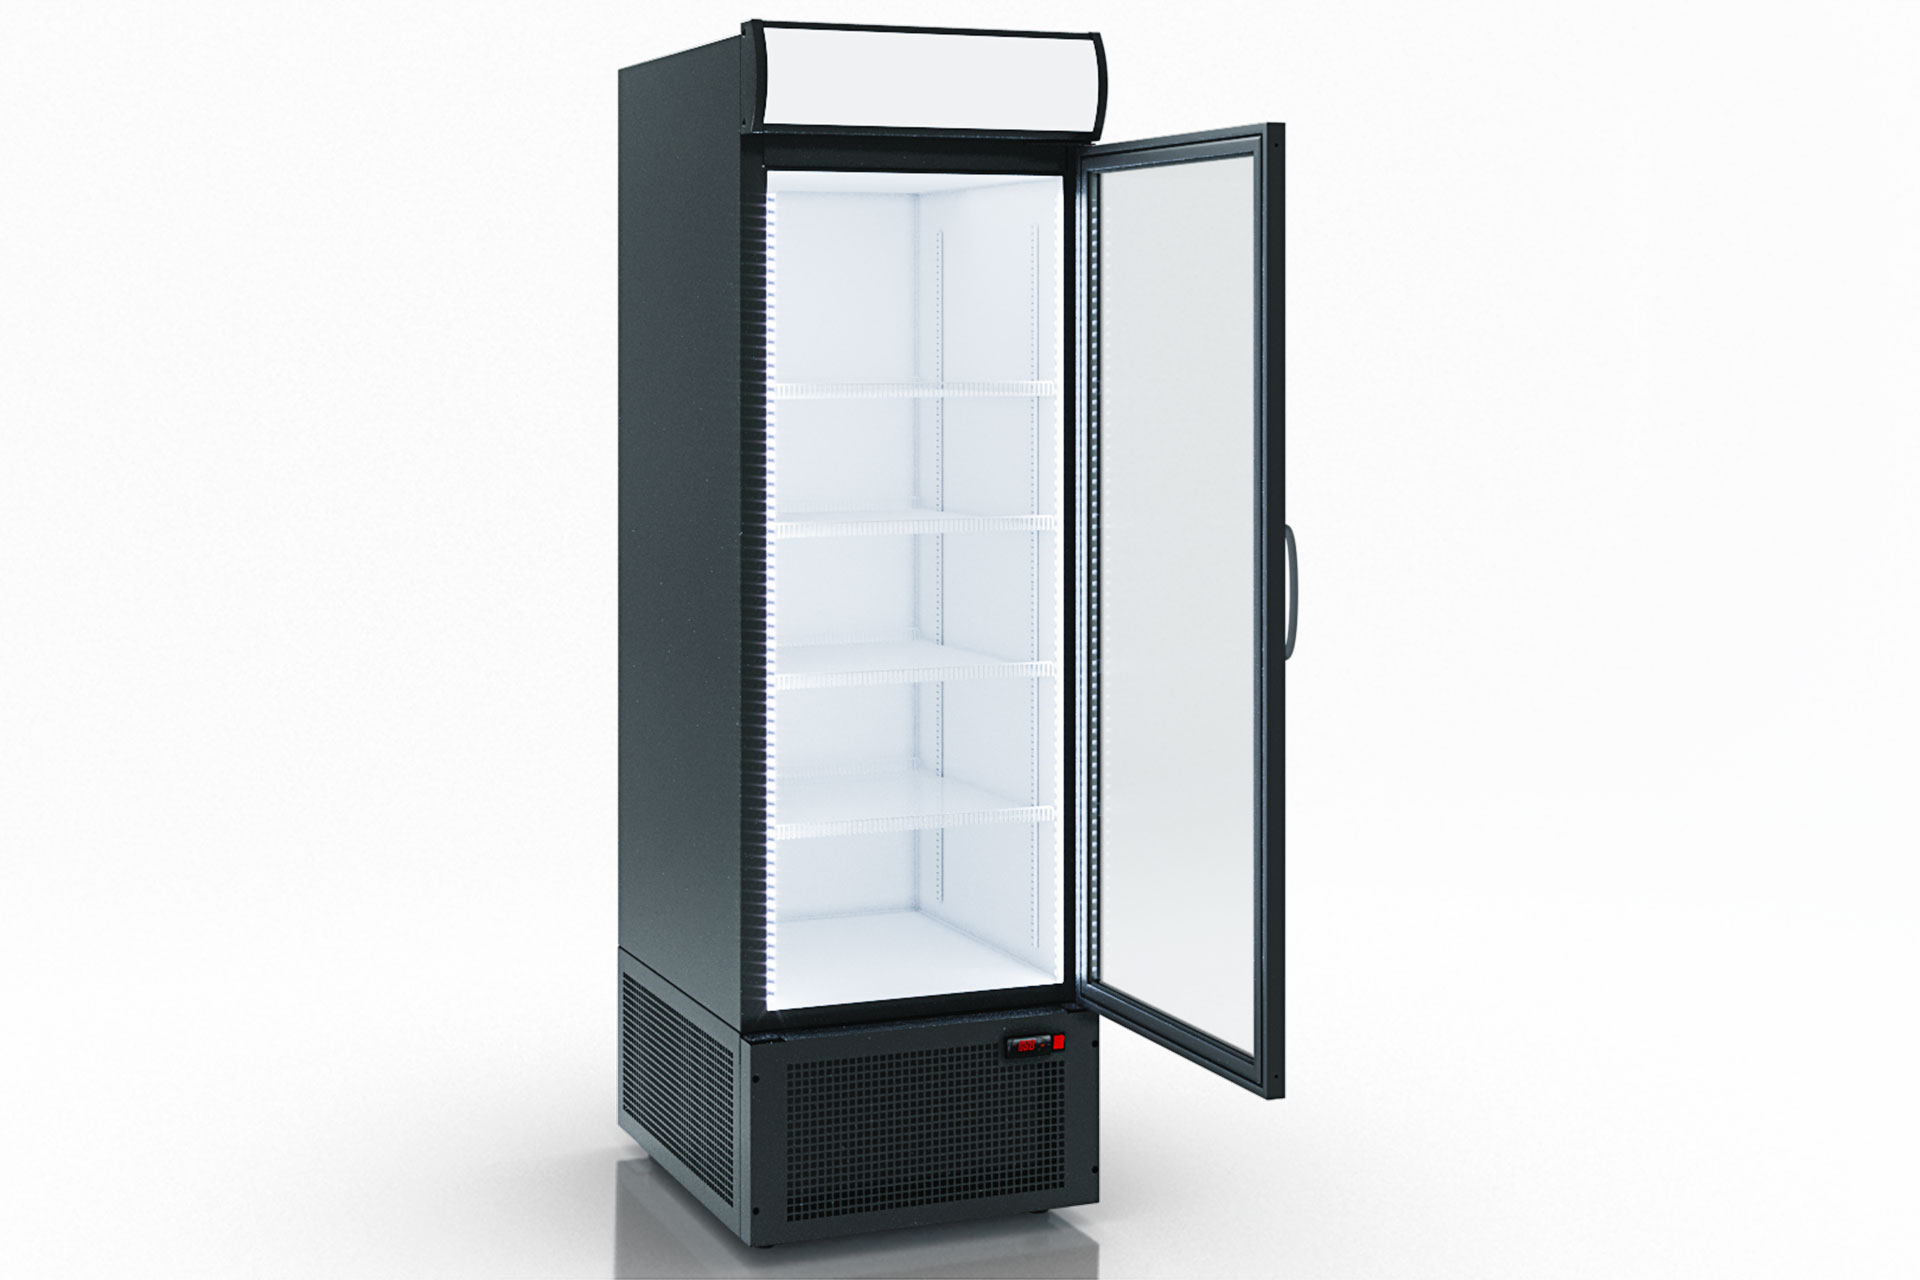 Szafy chłodnicze Kansas A1SG 065/075 MT/HT 1HD 210-D500/D600A-065